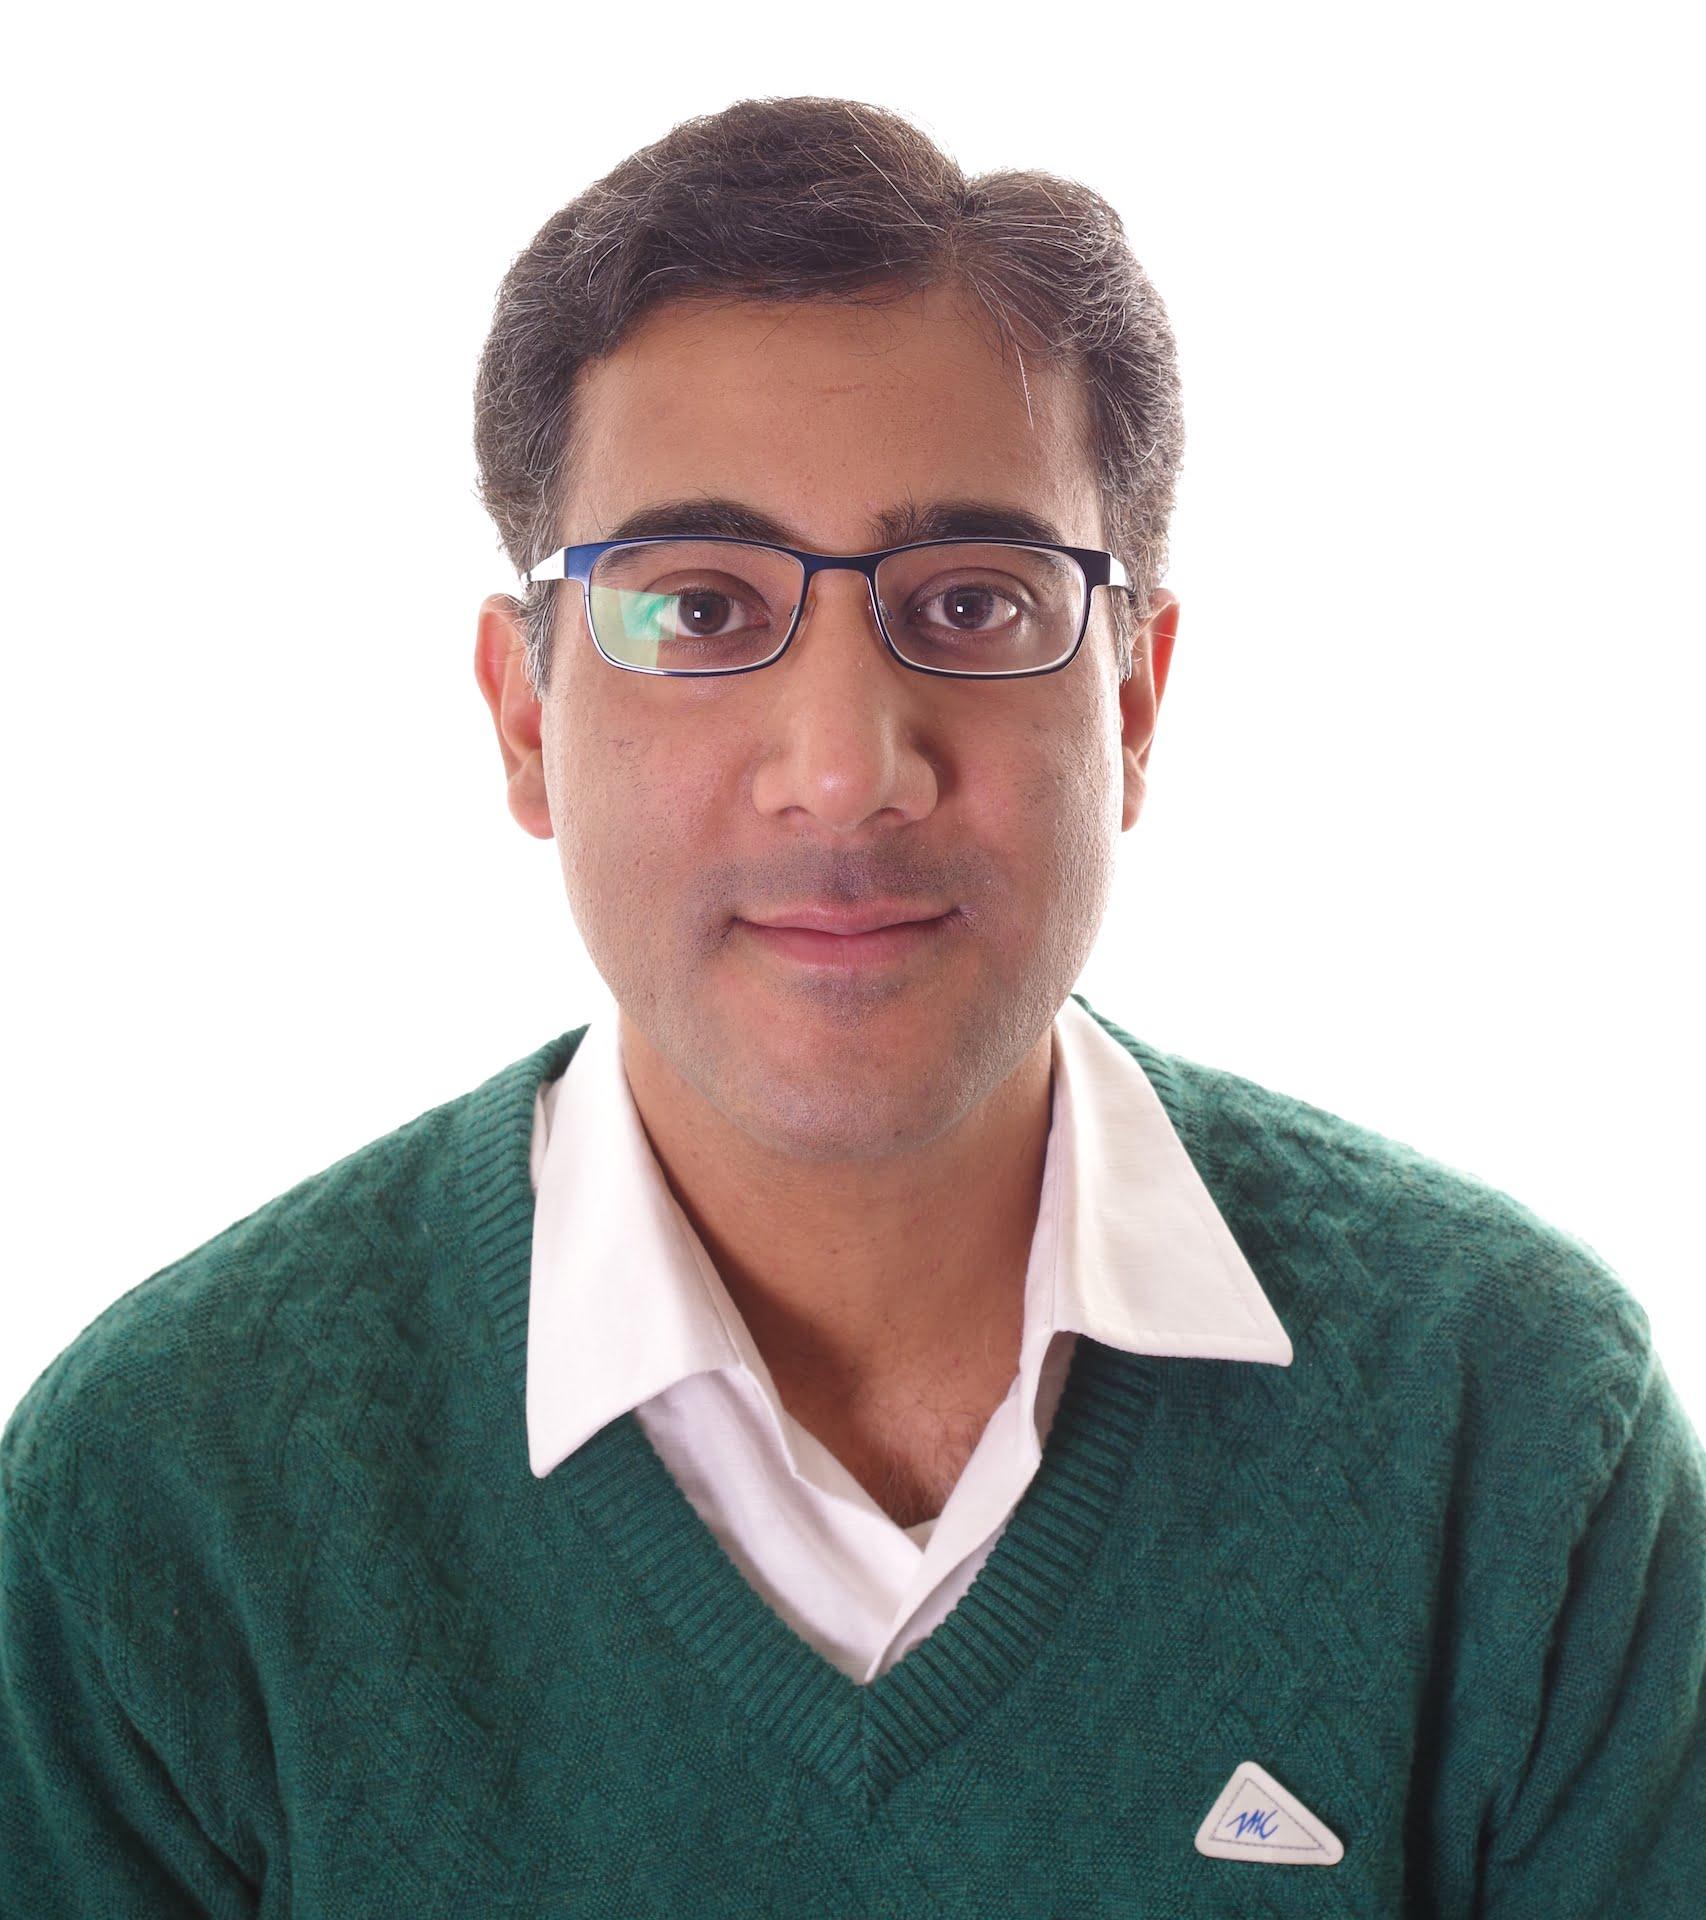 Dr. Vineet Batta